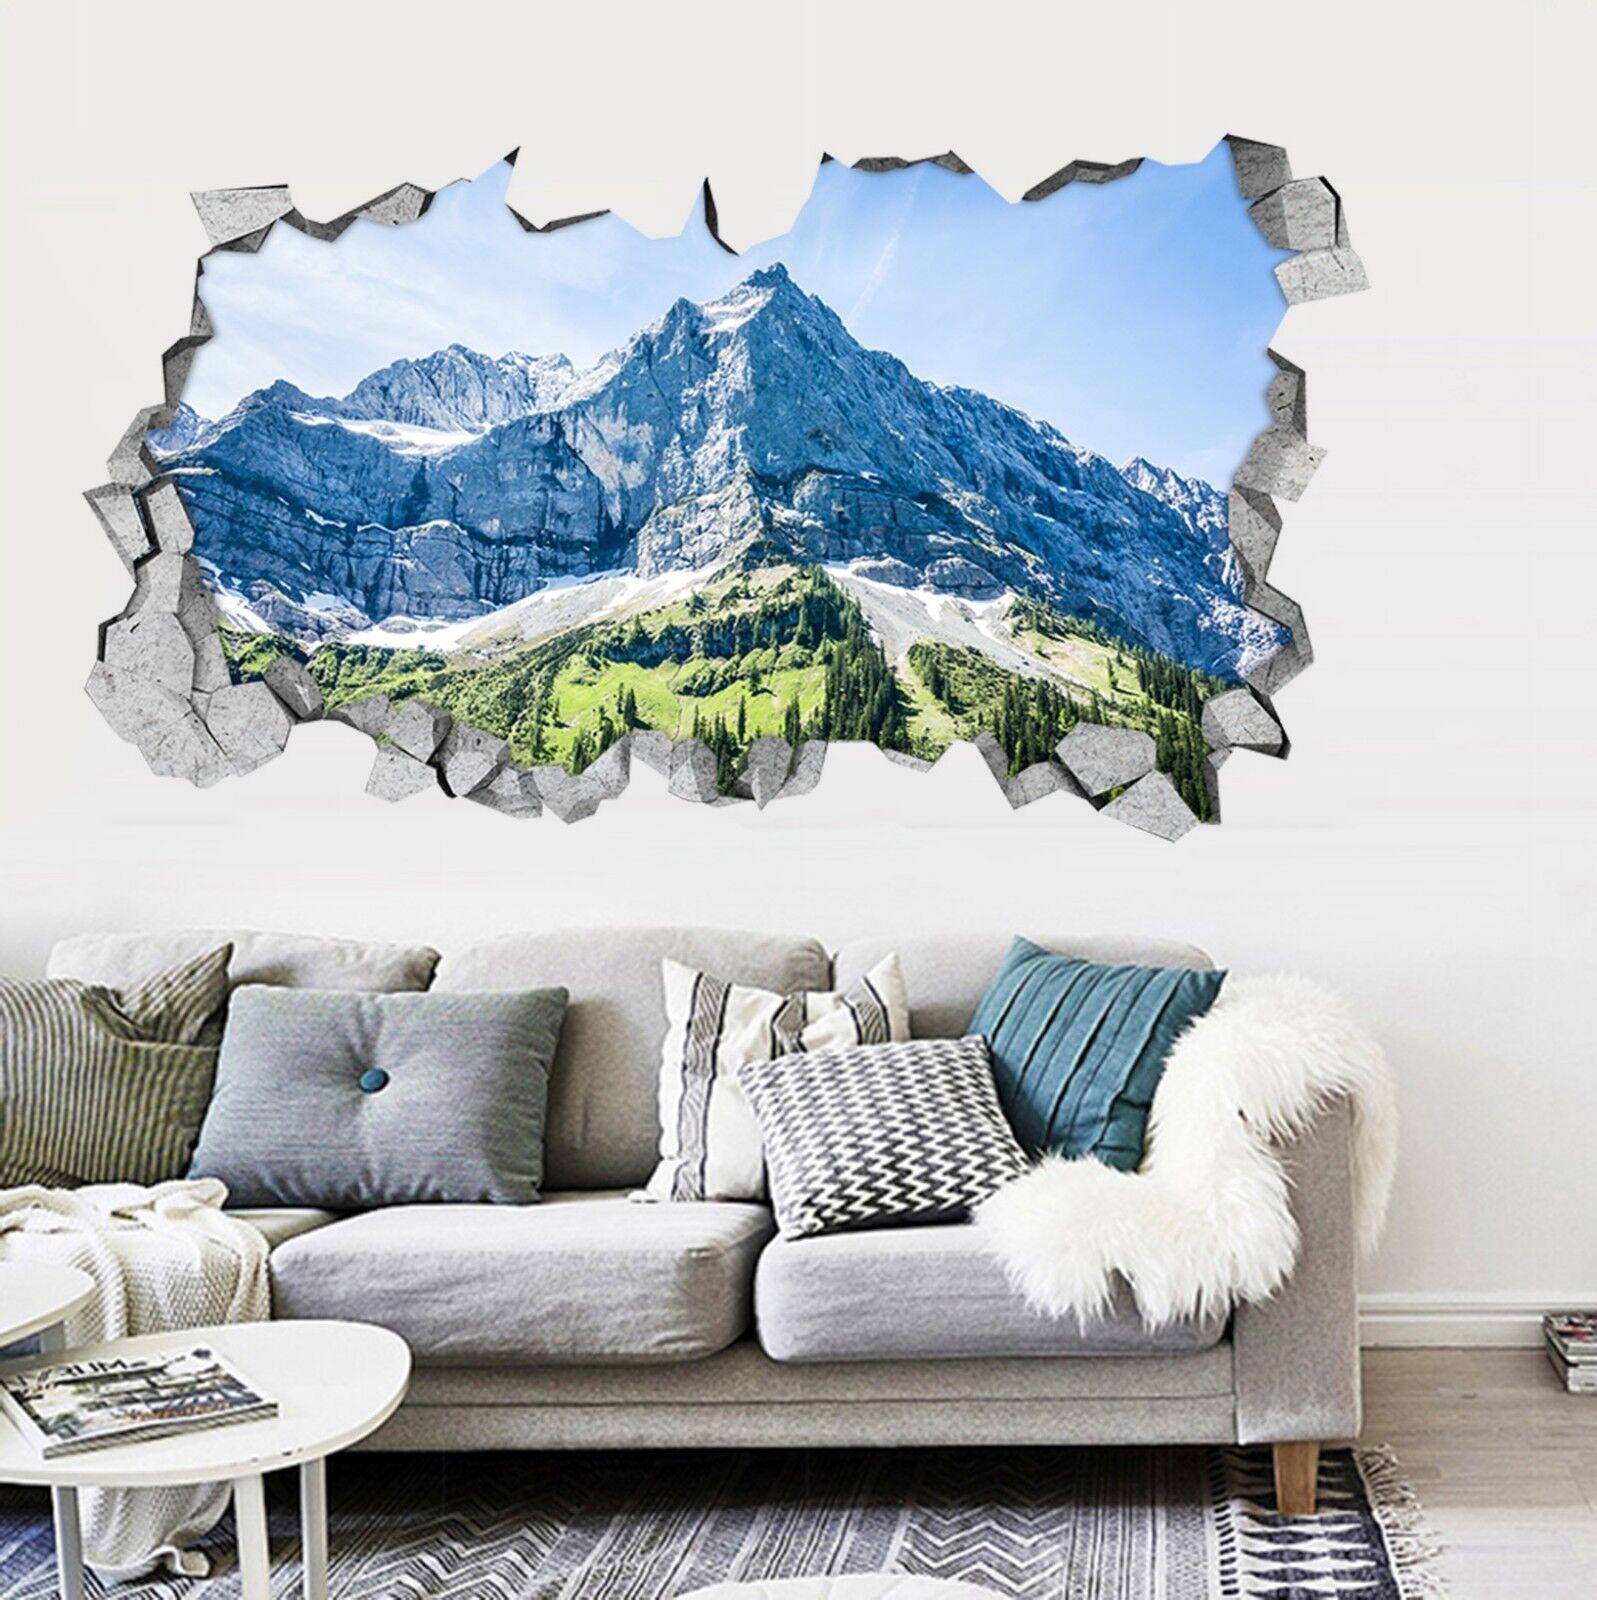 3D Pietra Montagna 0027 Parete Murales Adesivi Decal Sfondamento AJ WALLPAPER IT